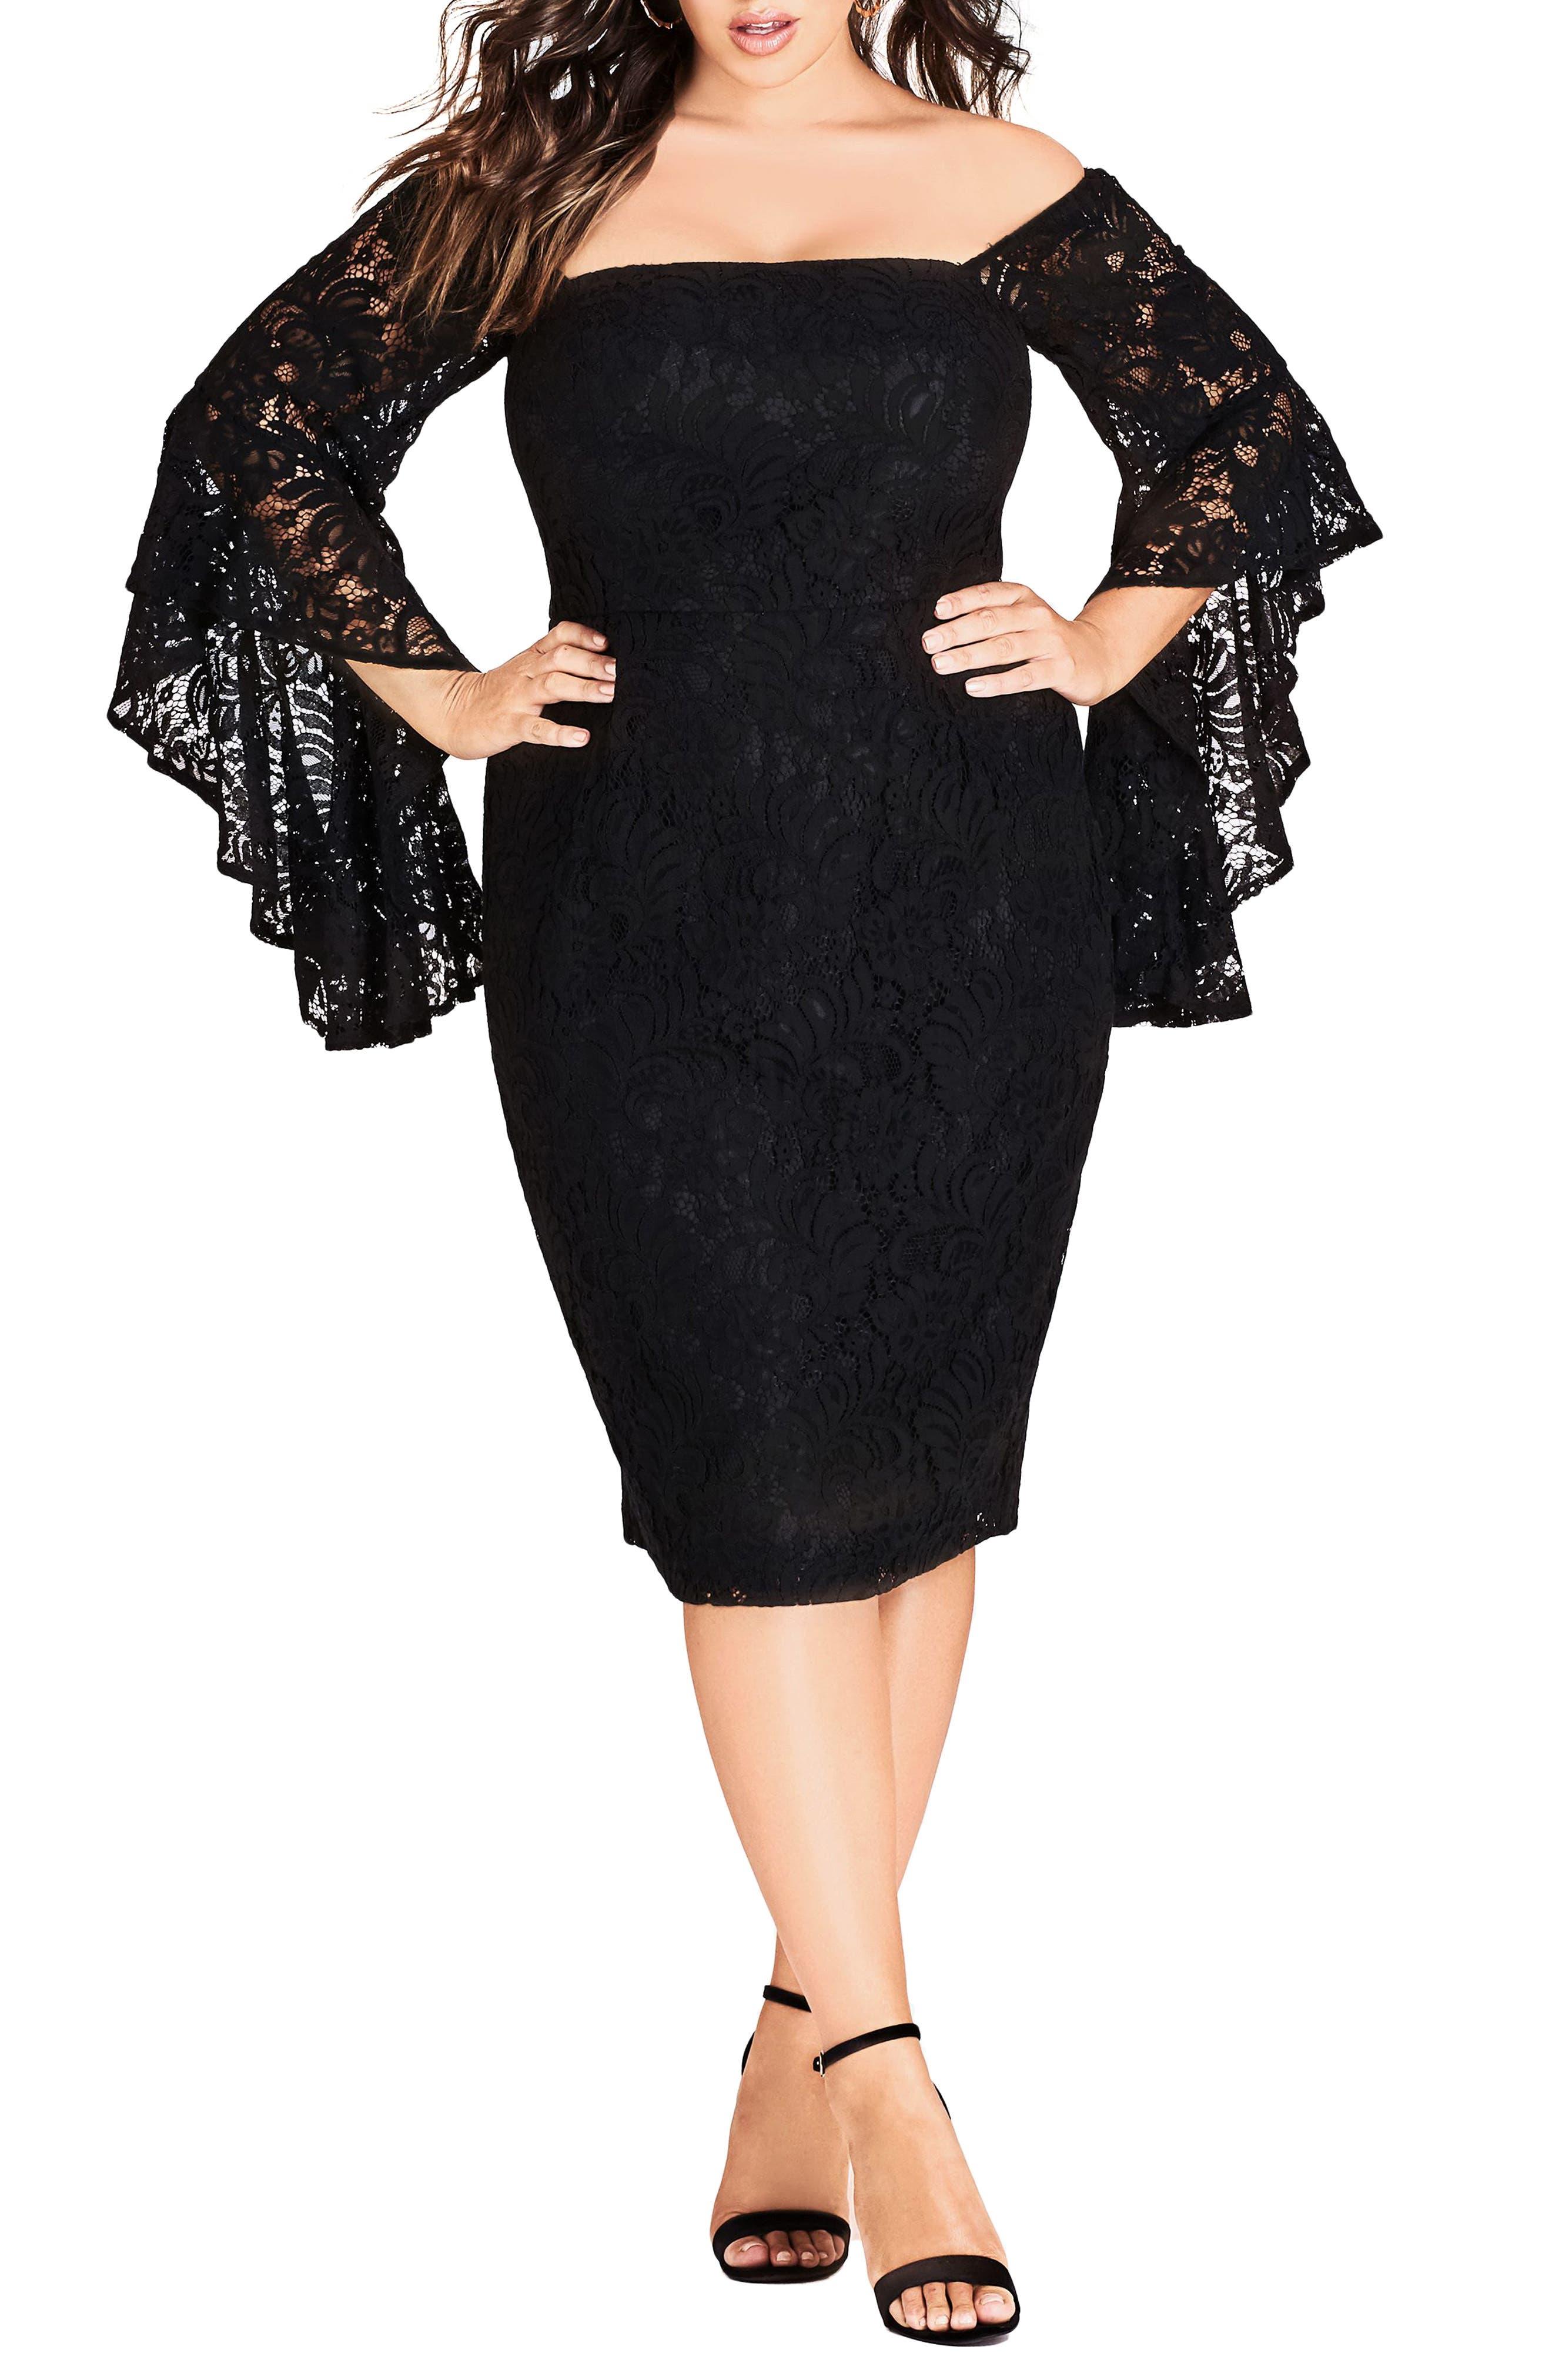 Mystic Lace Dress,                             Main thumbnail 1, color,                             Black